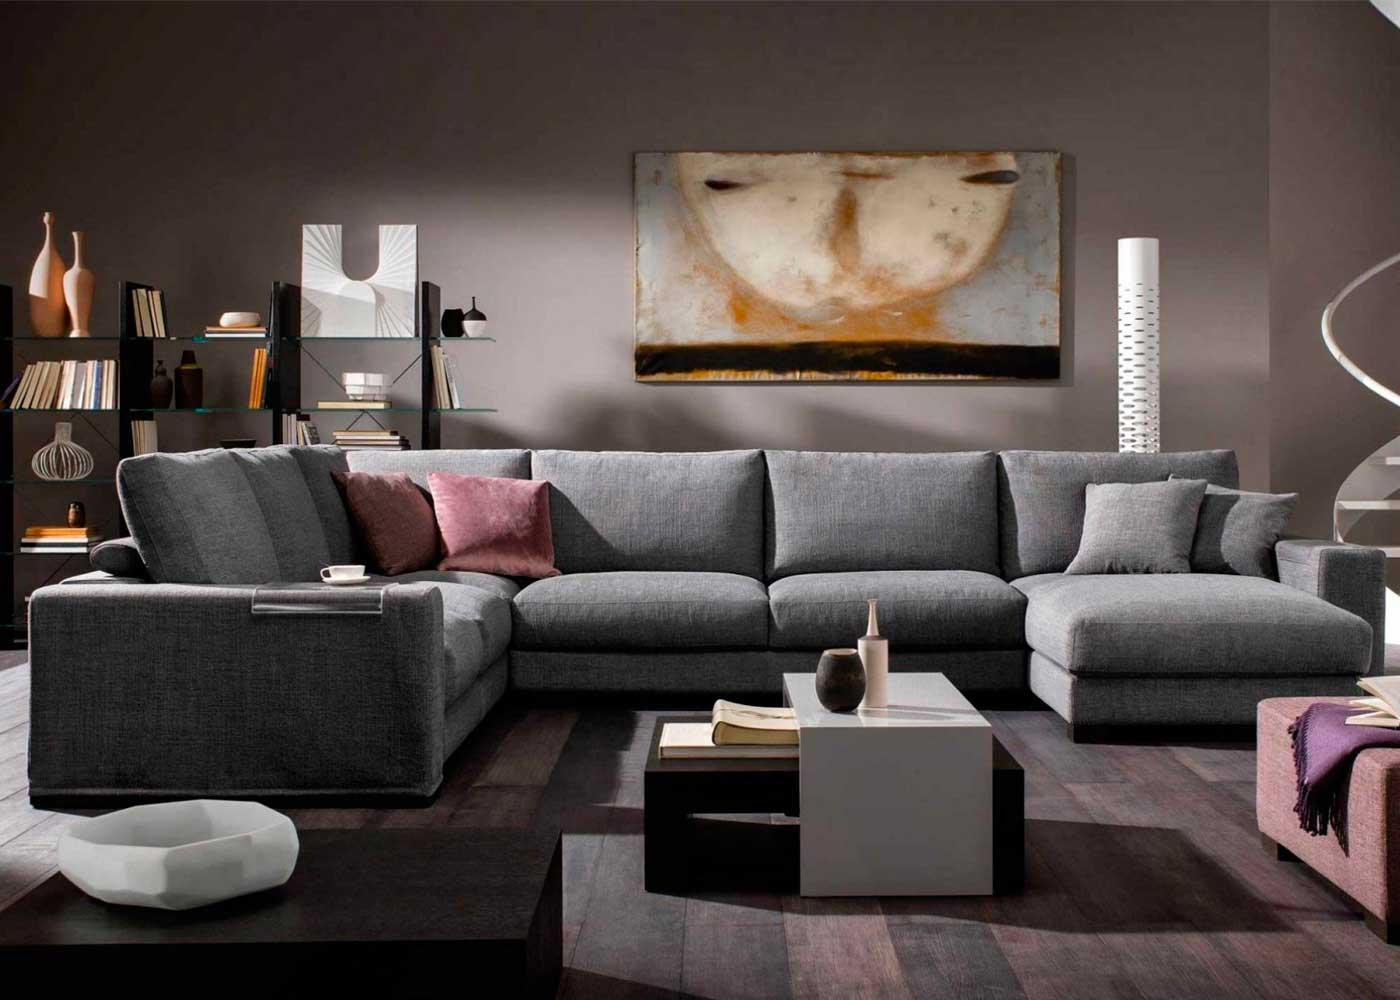 corner leather sofas uk palliser sofa edmonton natuzzi domino - midfurn furniture superstore